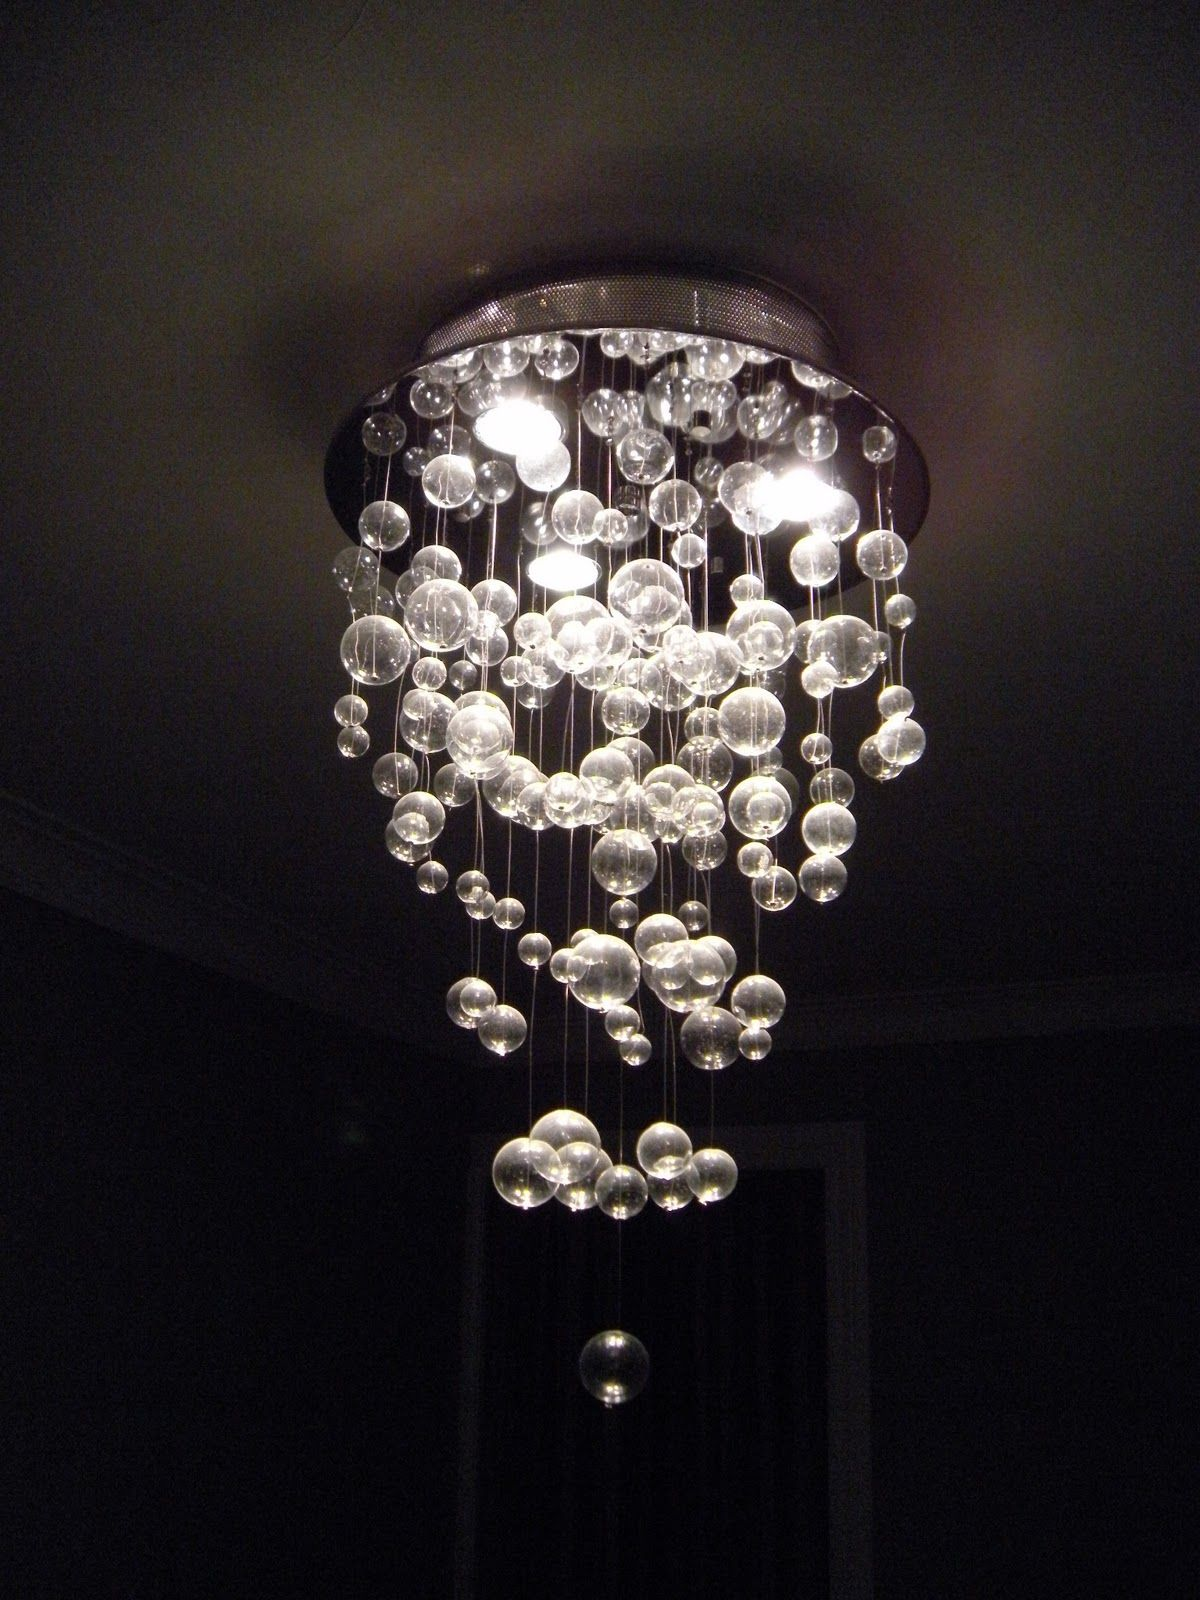 I sooo want a bubble chandelier over my bathtub decor ideas i sooo want a bubble chandelier over my bathtub aloadofball Images